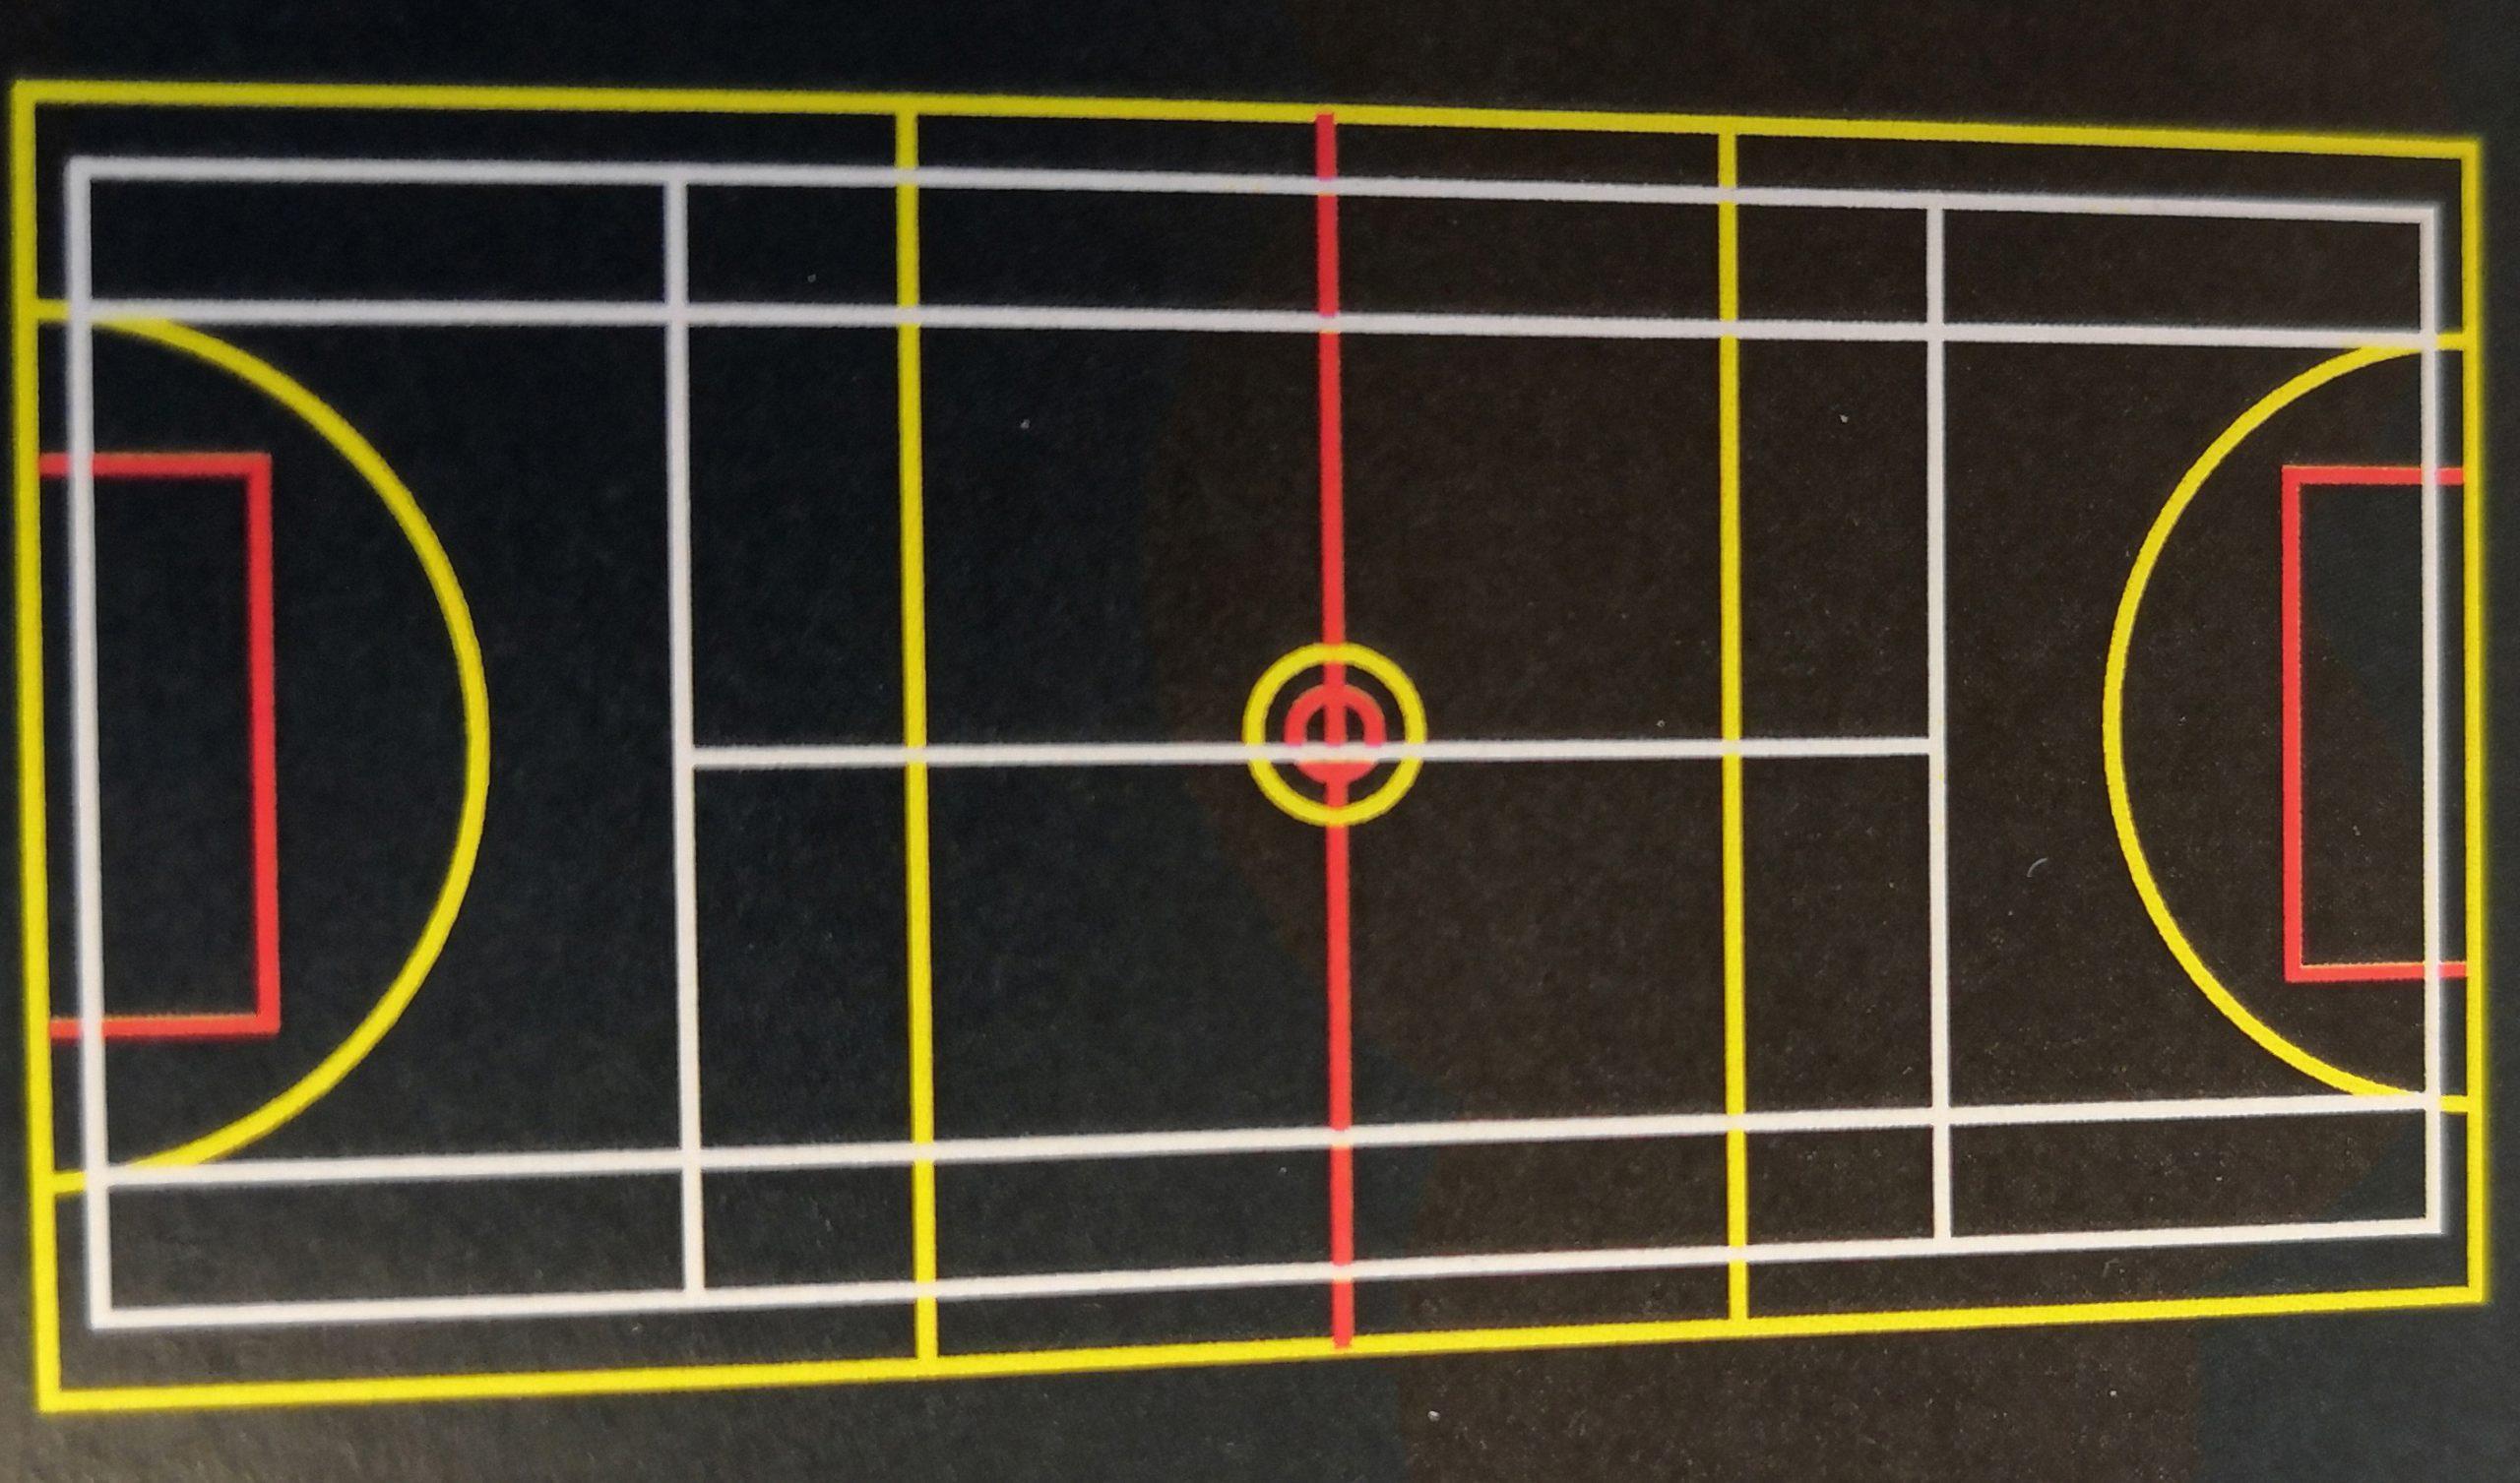 Landscape - multi-court-8-ntball-football-tennis